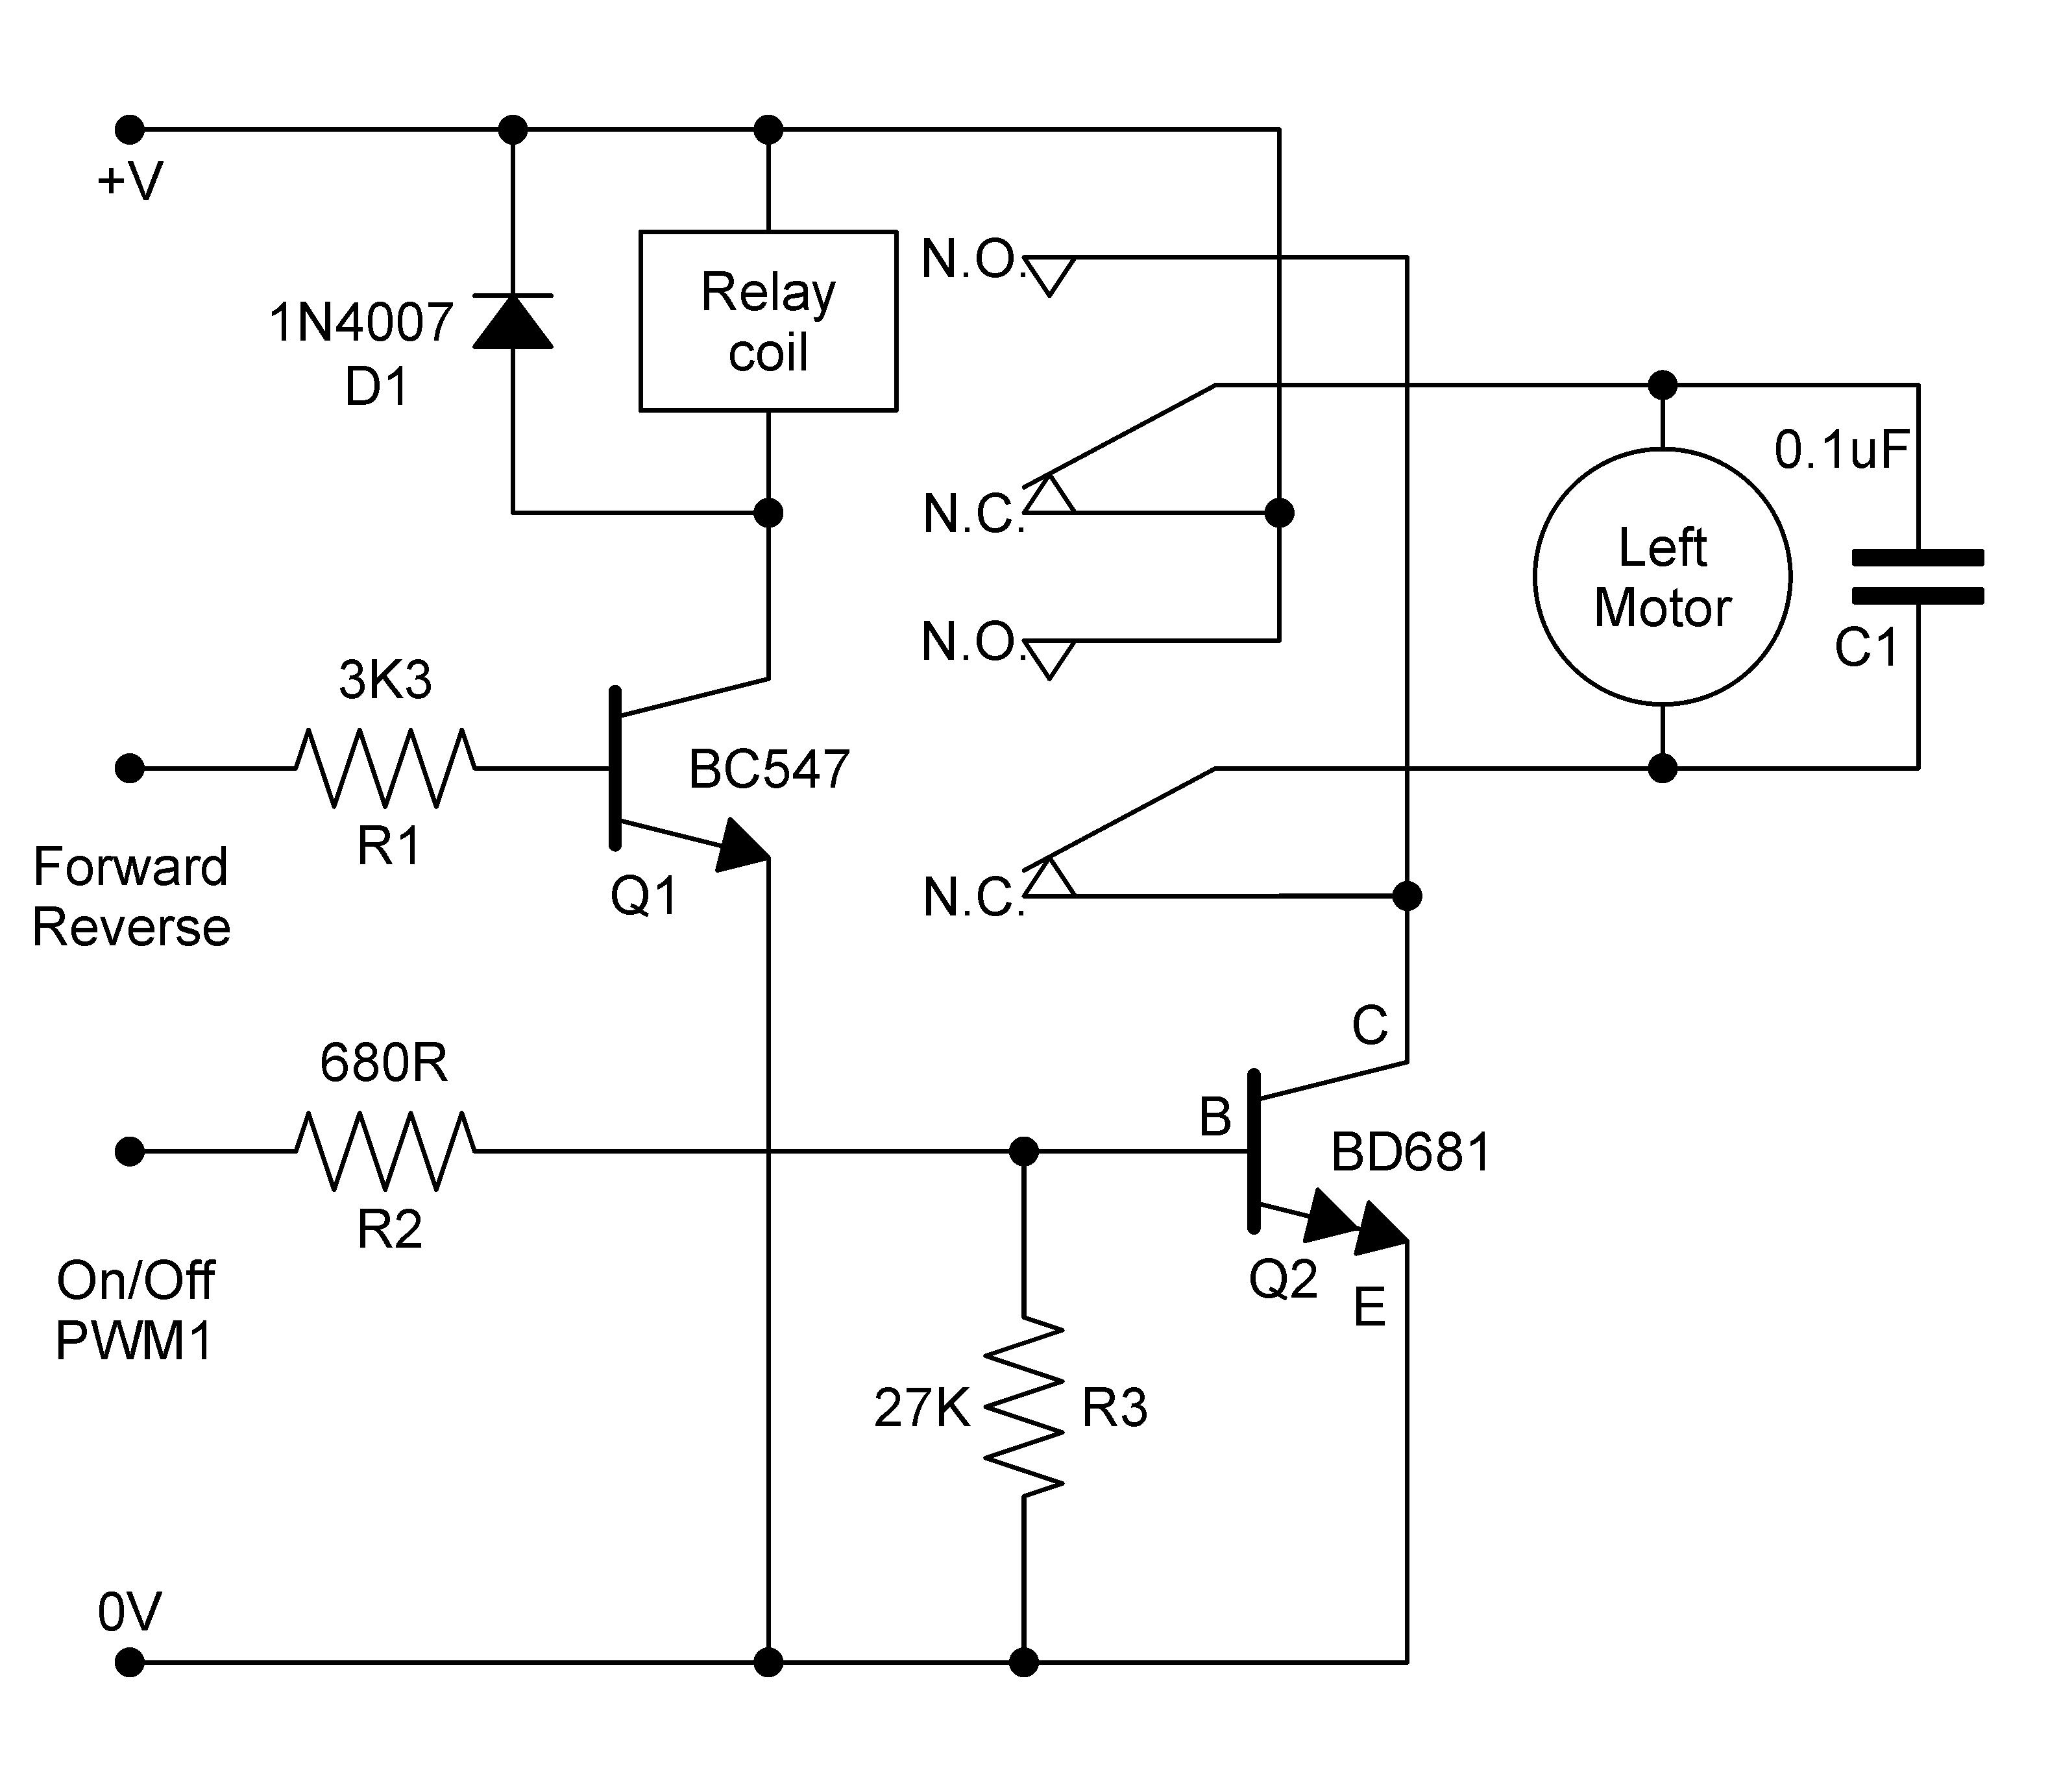 bridge relay circuit diagram [ 3156 x 2762 Pixel ]